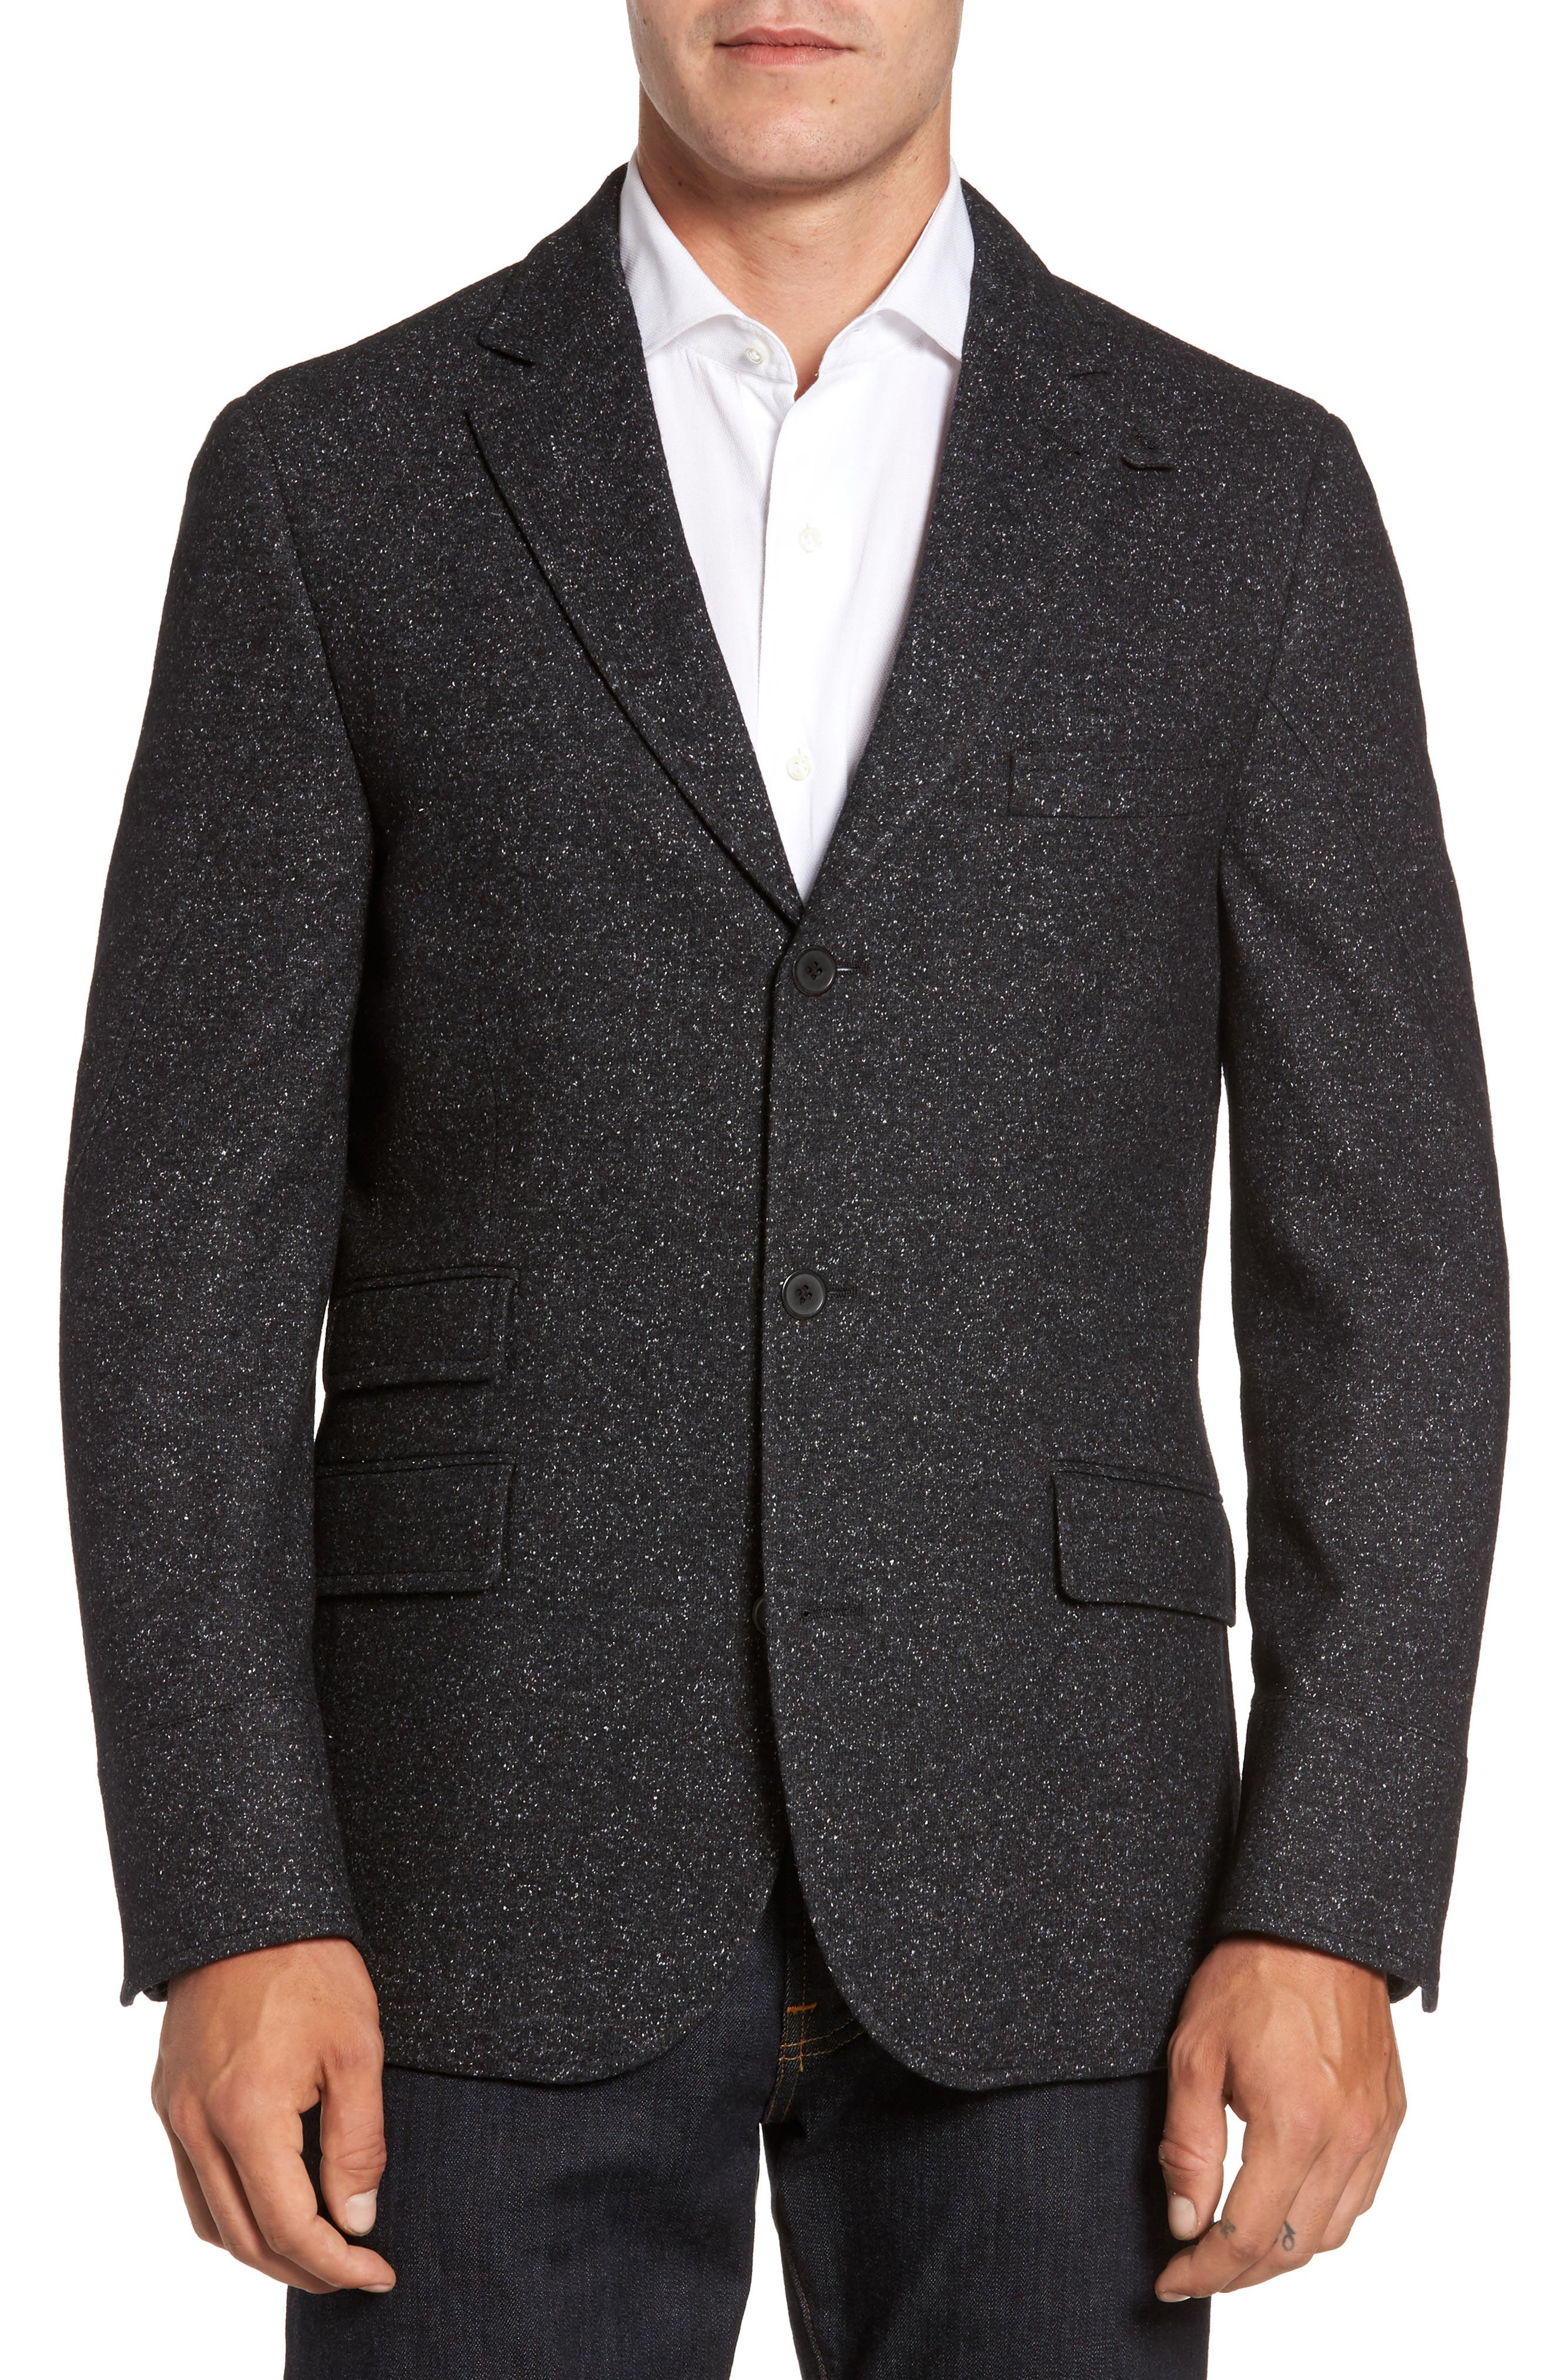 Donegal Wool Blend Hybrid Coat,                             Alternate thumbnail 4, color,                             021